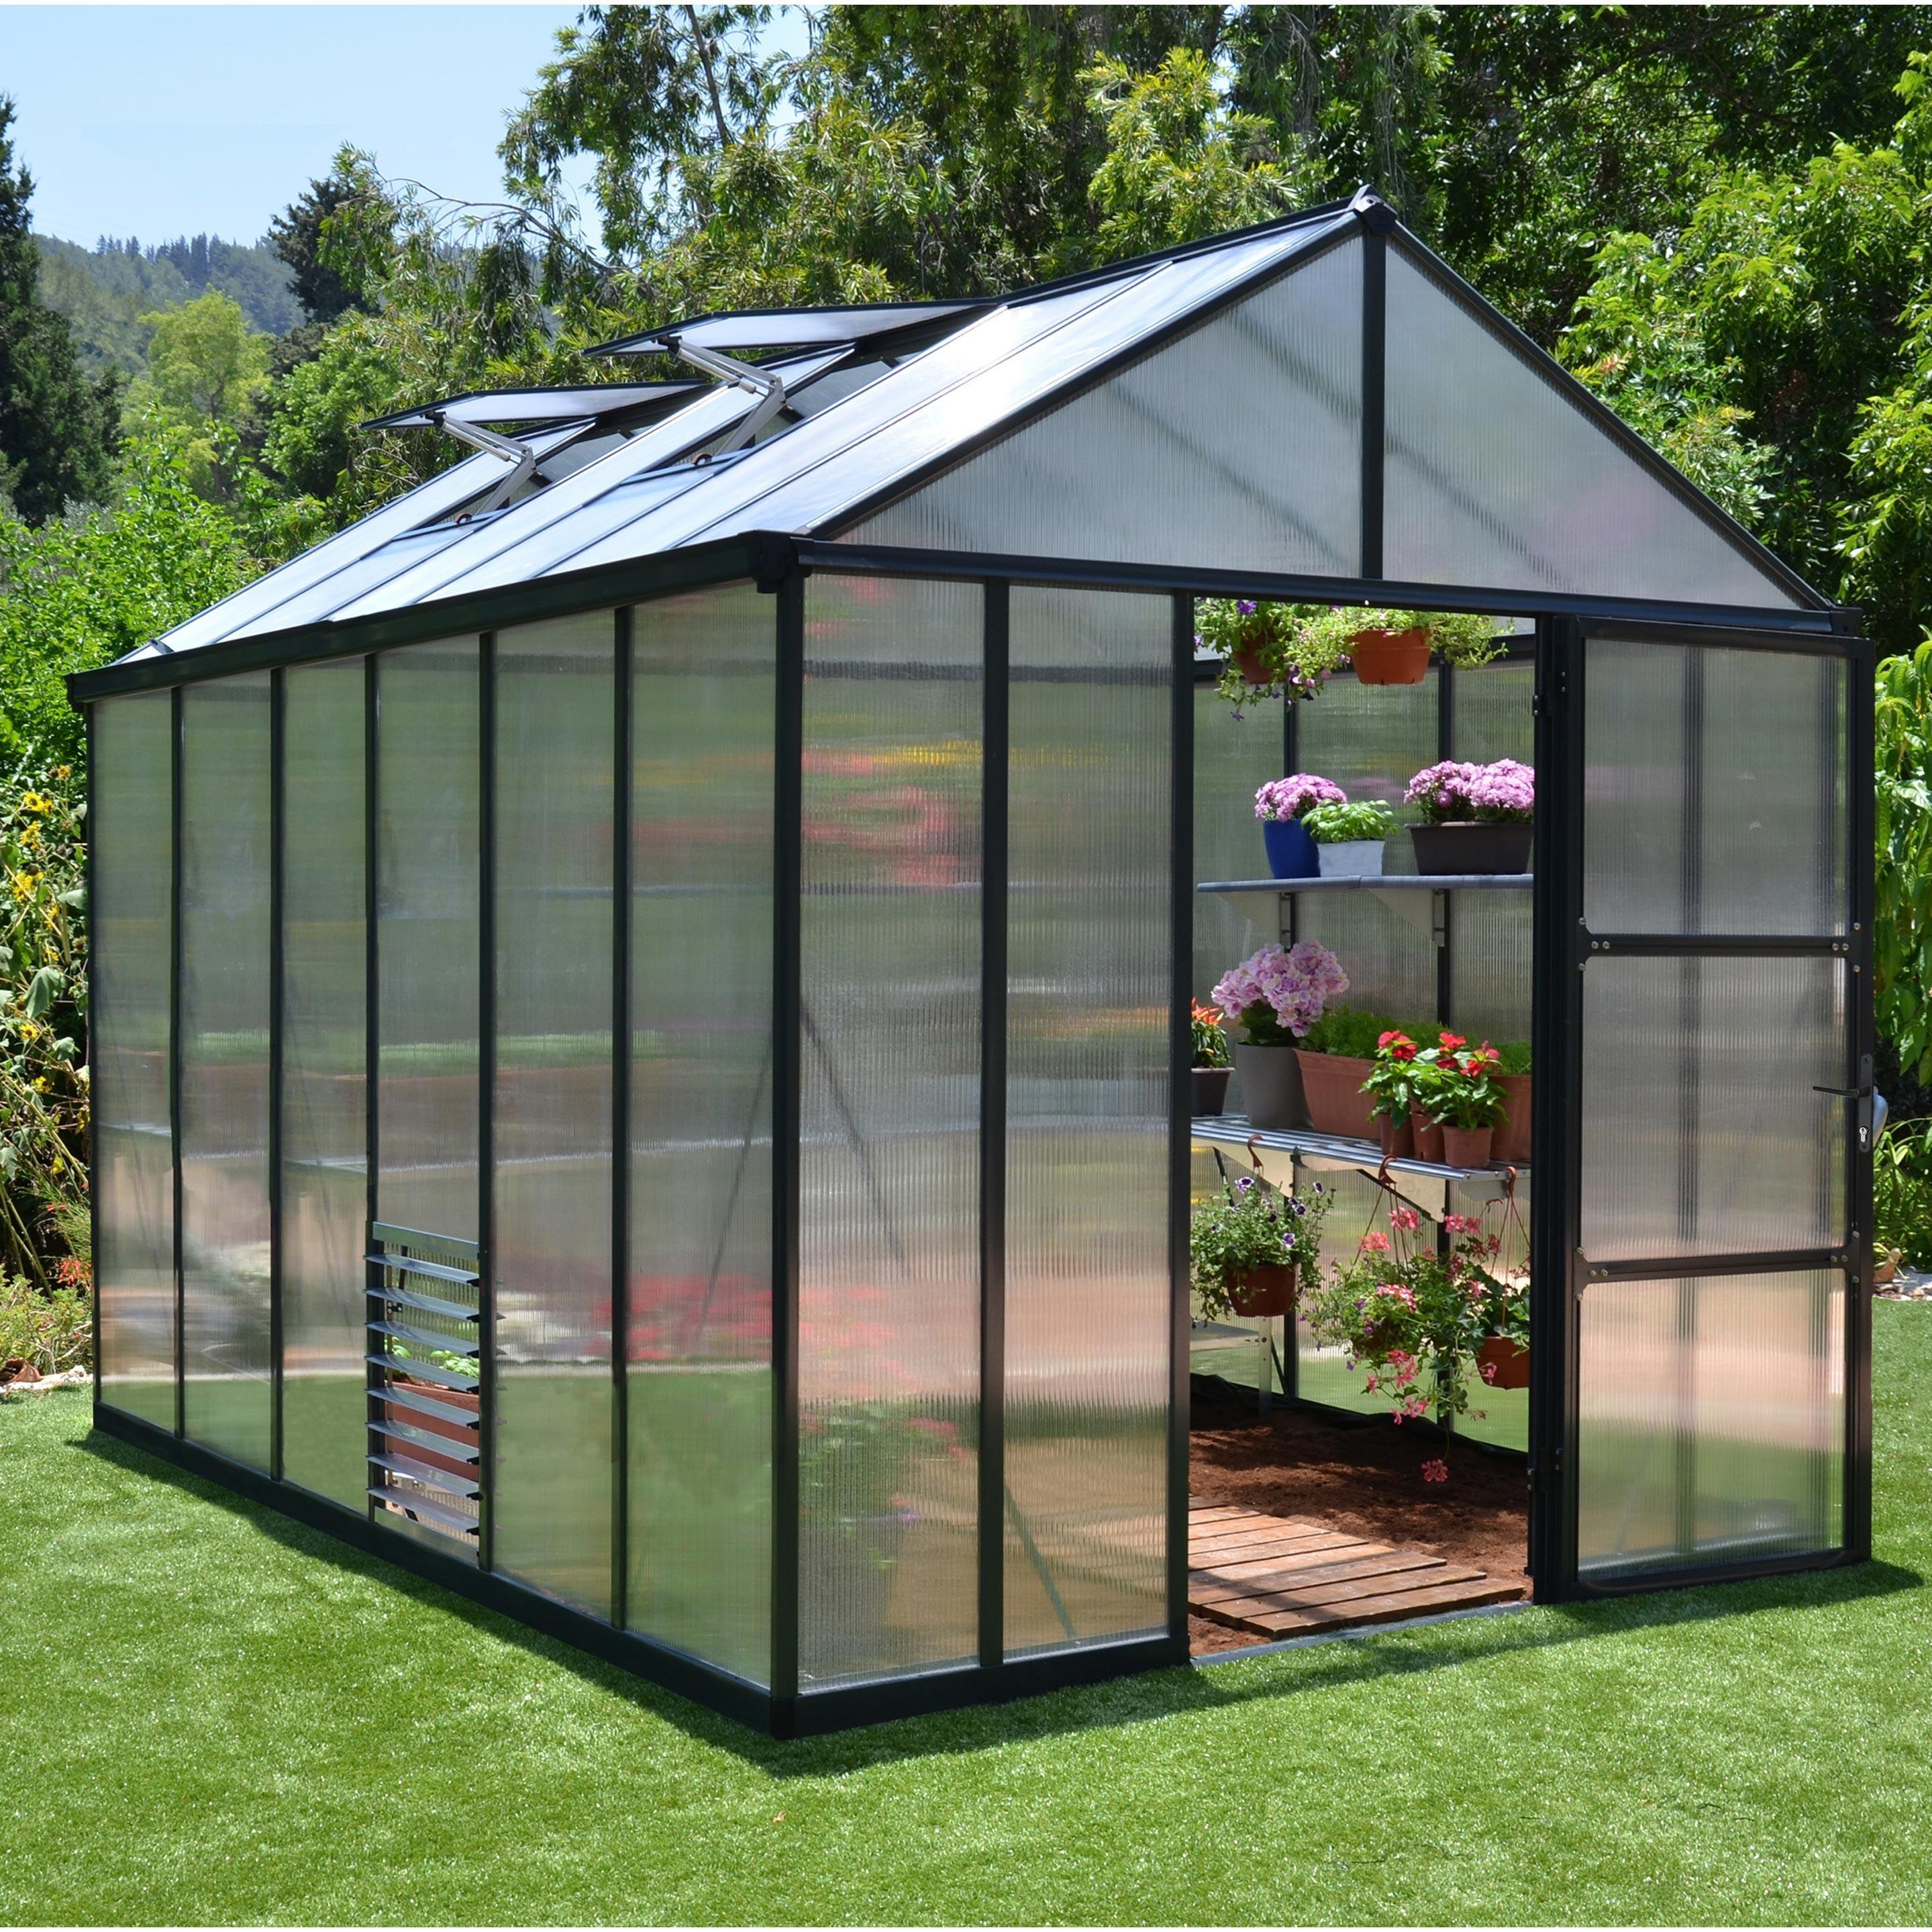 Serre De Jardin Glory 8 6 M Aluminium Et Polycarbonate Double Parois Palram En 2020 Serre Arriere Cour Serre Jardin Maison Verte